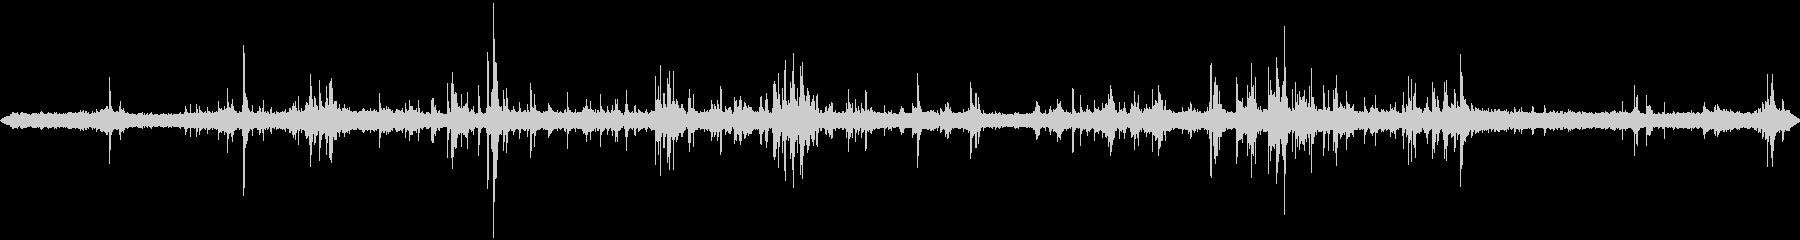 [ASMR] 風鈴とカエル_01の未再生の波形